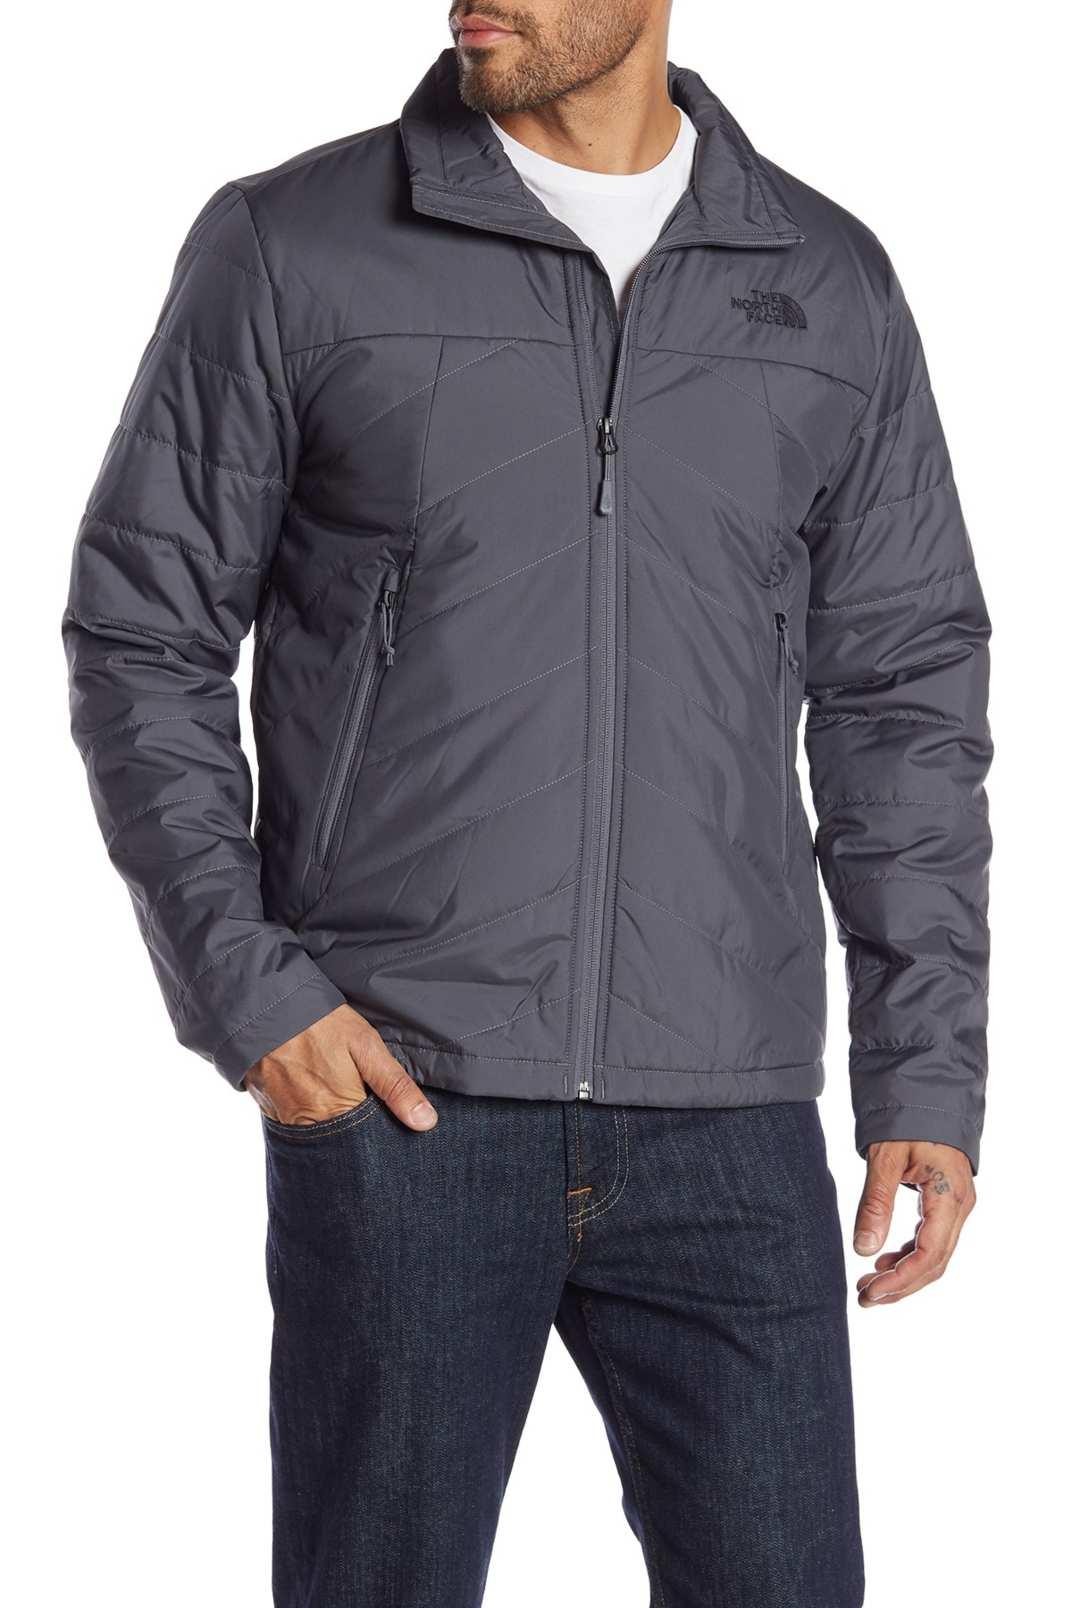 The North Face Saxony Jacket